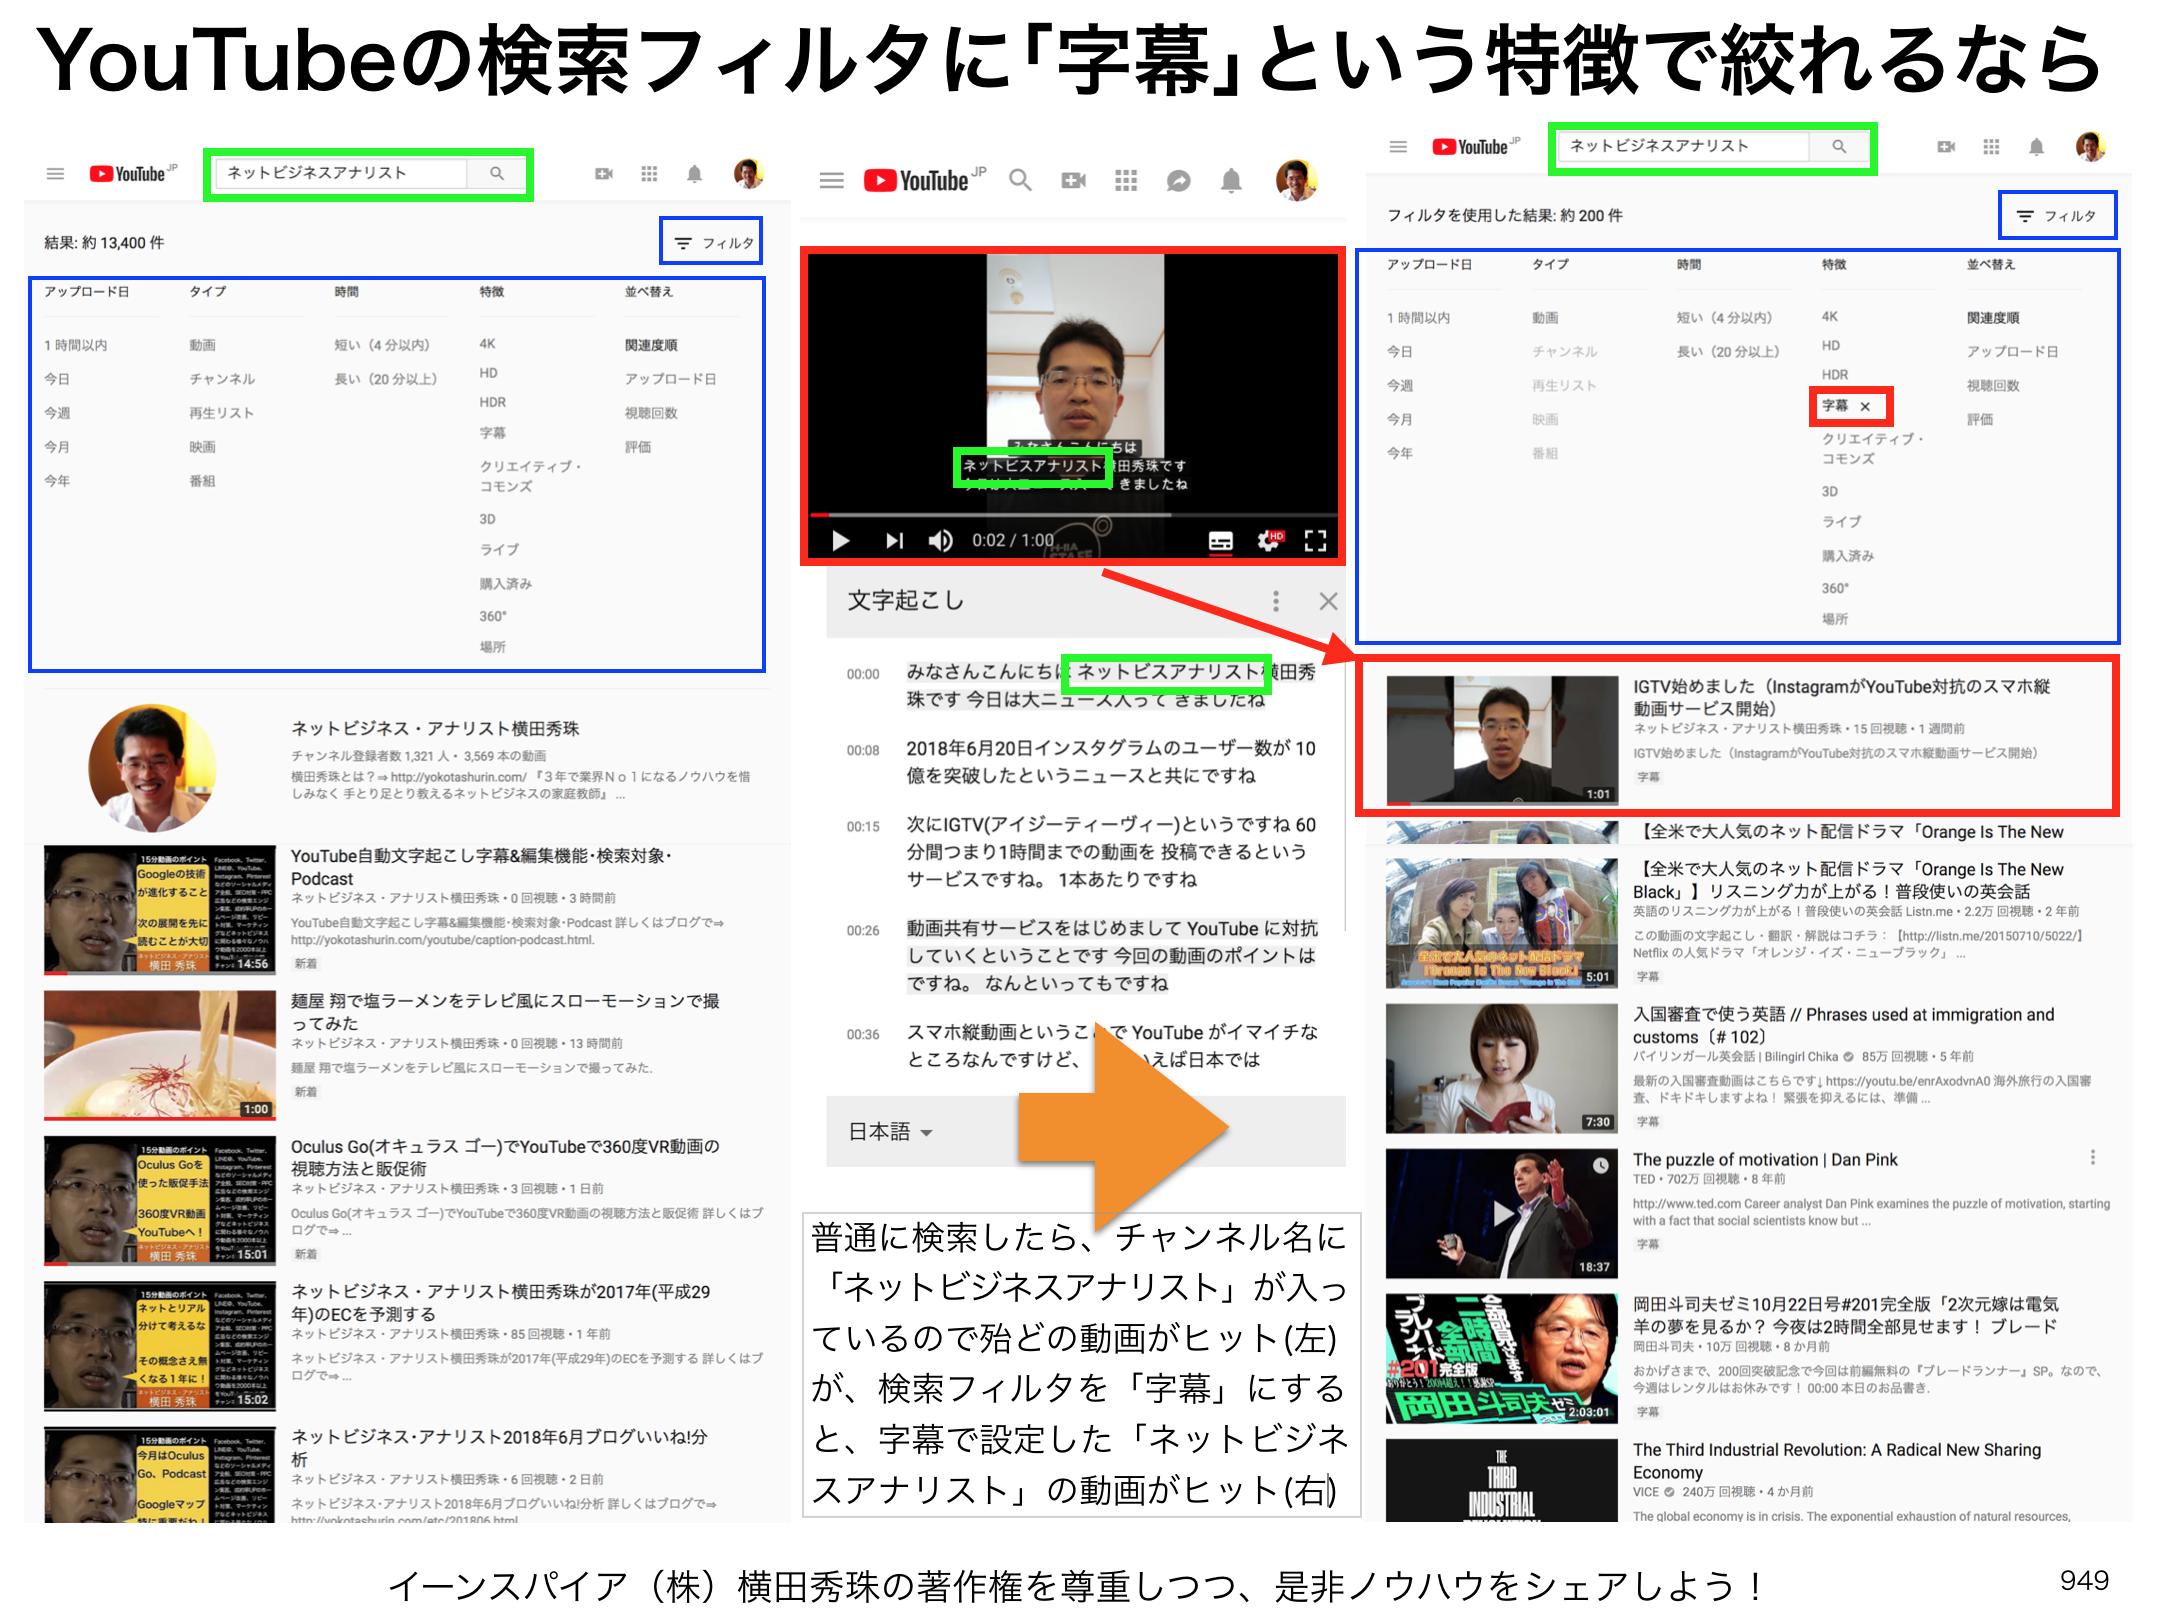 YouTube自動文字起こし字幕&編集機能・検索対象・Podcast